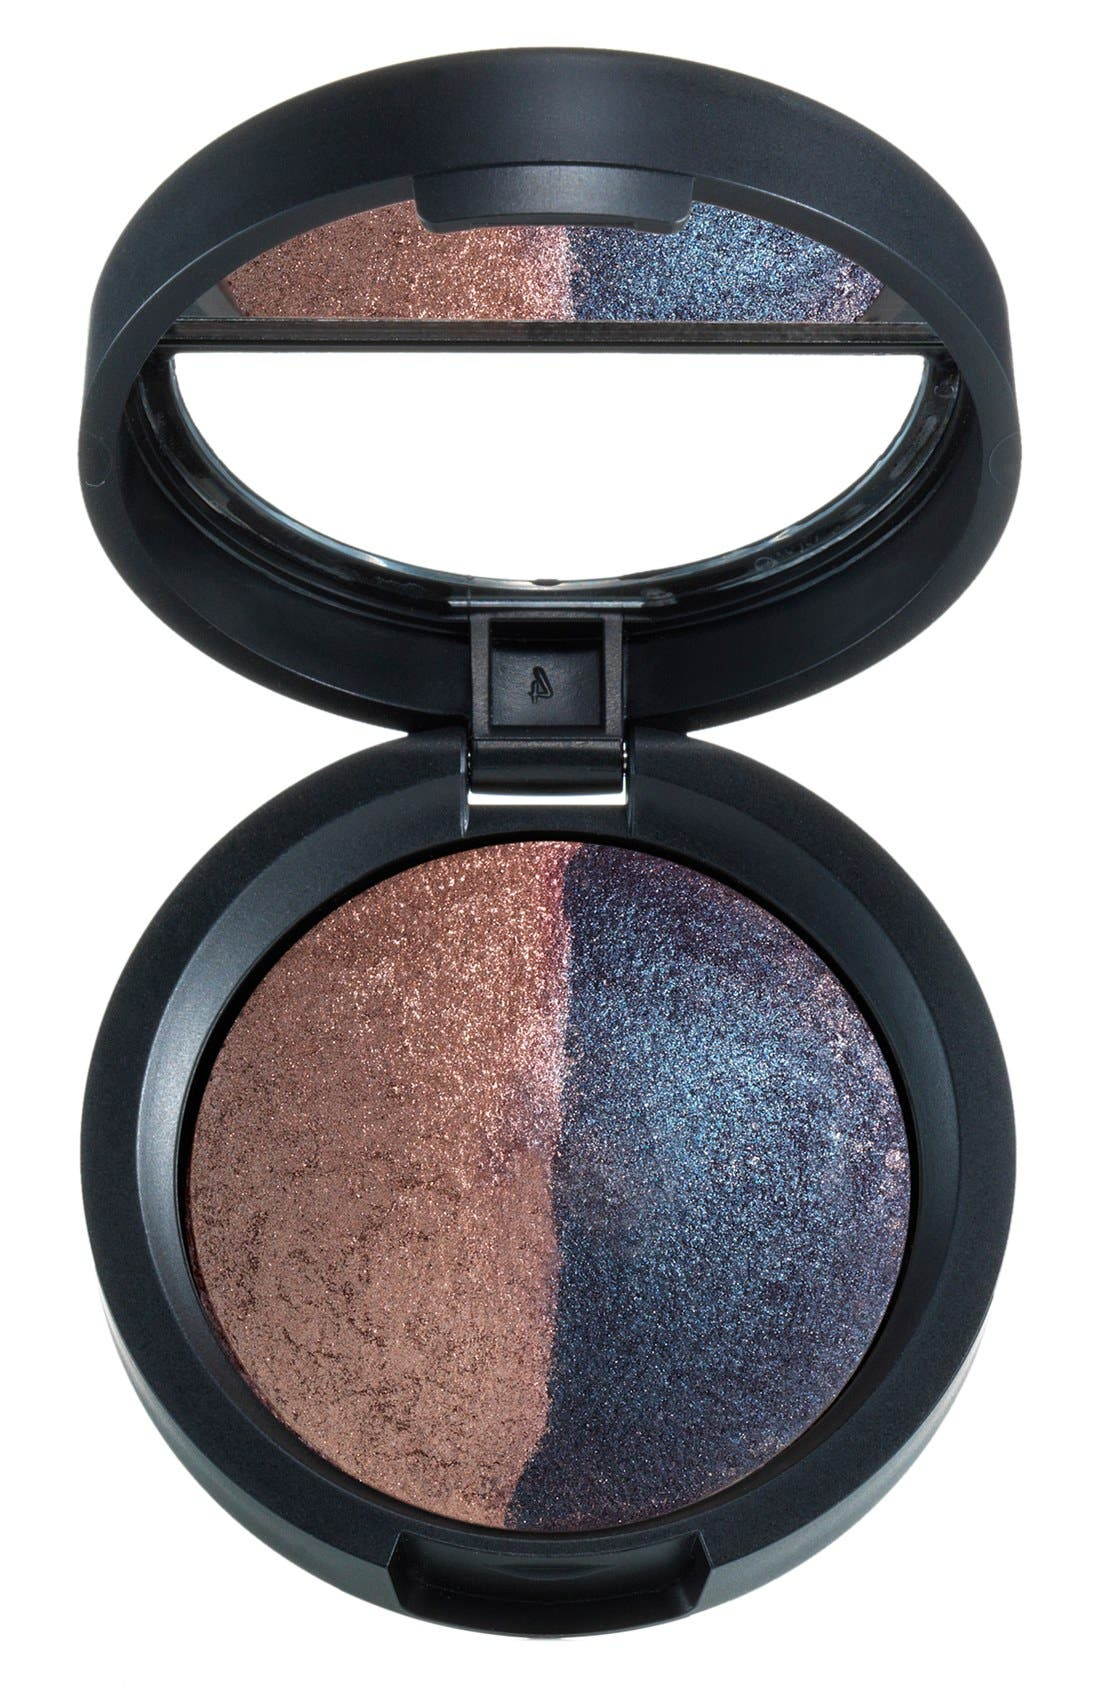 Baked Color Intense Eyeshadow Duo,                             Main thumbnail 6, color,